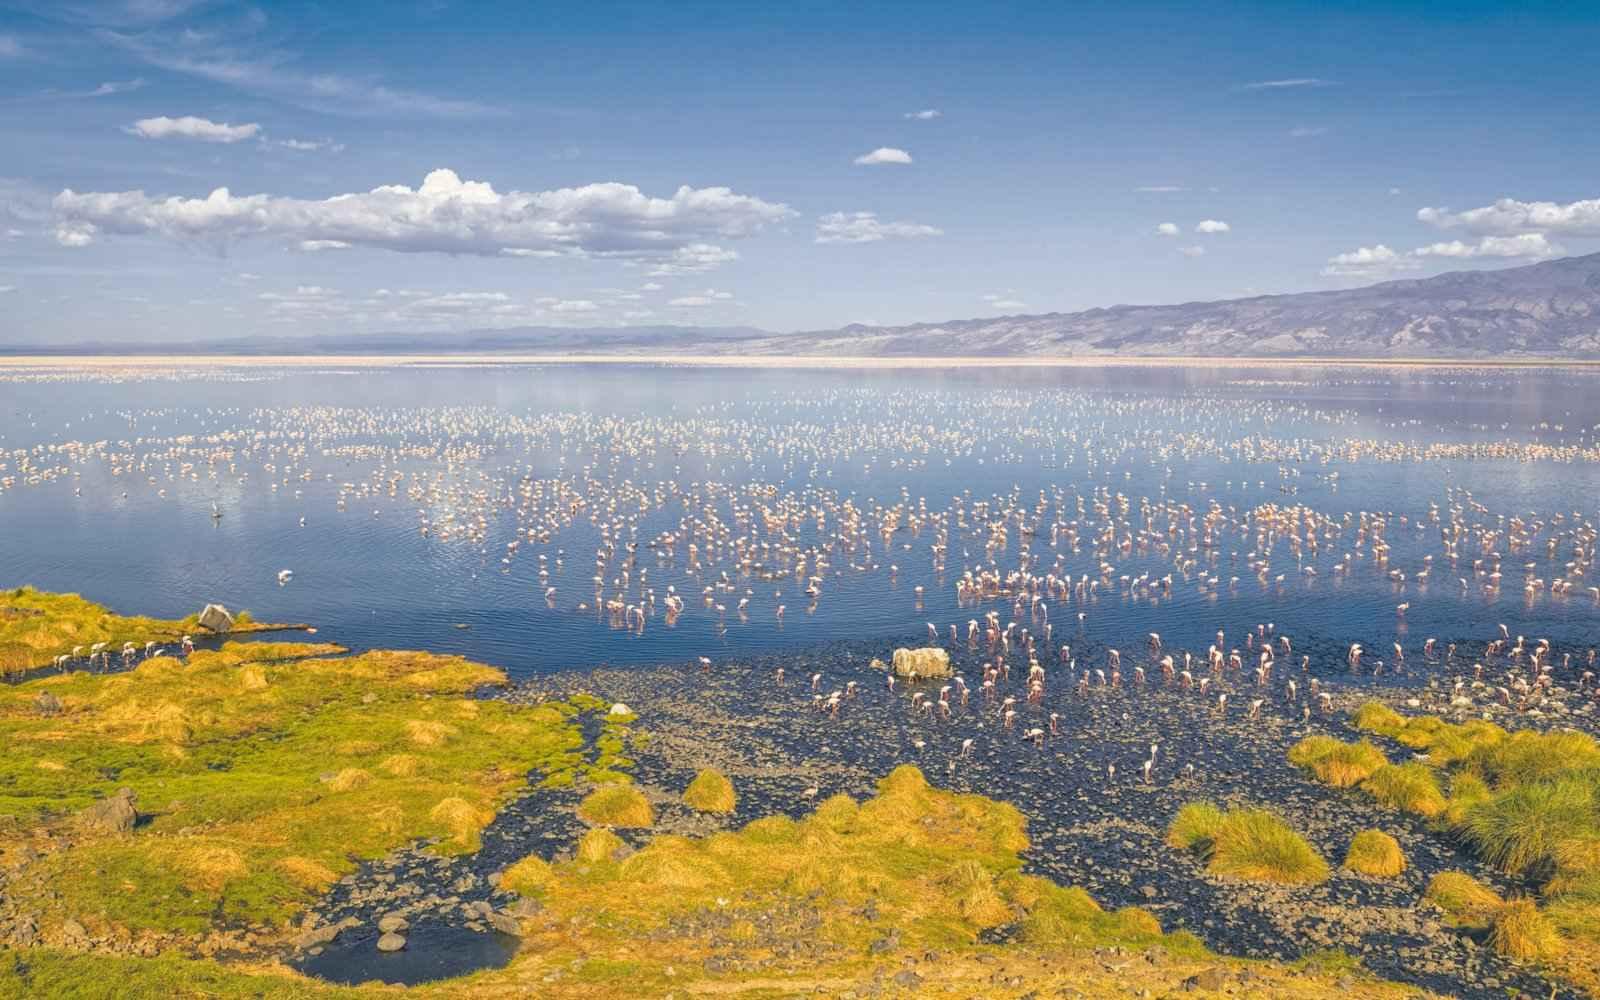 nortron - دریاچه ناترون یا گورستان مخوف پرندگان!